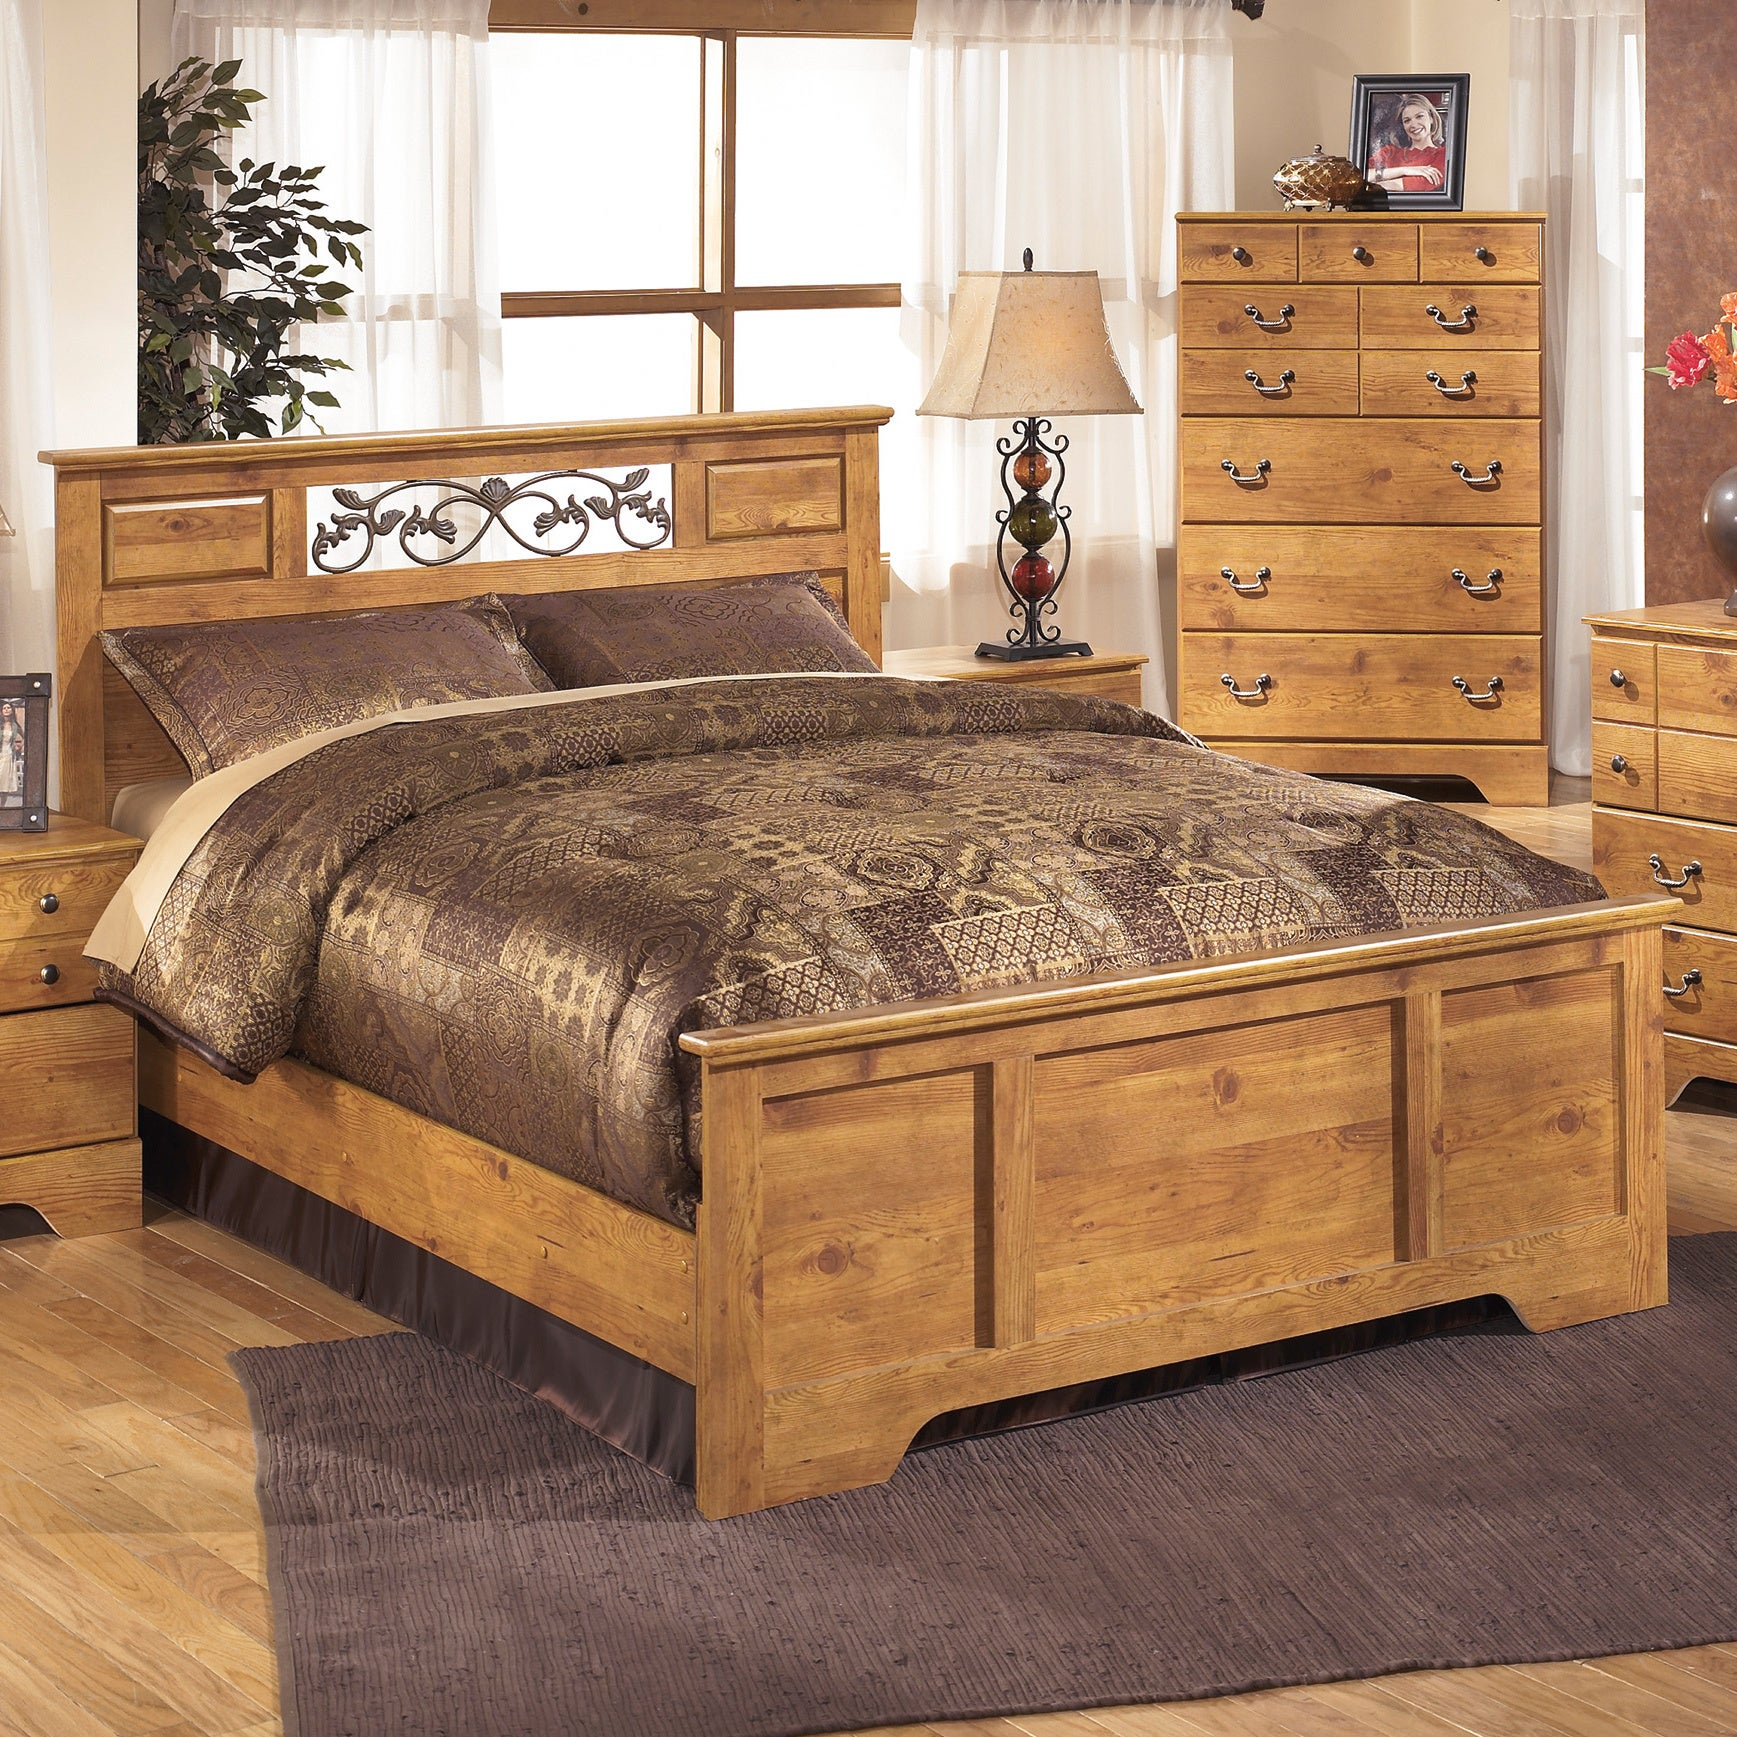 Ashley Bittersweet Queen-size Panel Bed (Queen Panel Bed)...